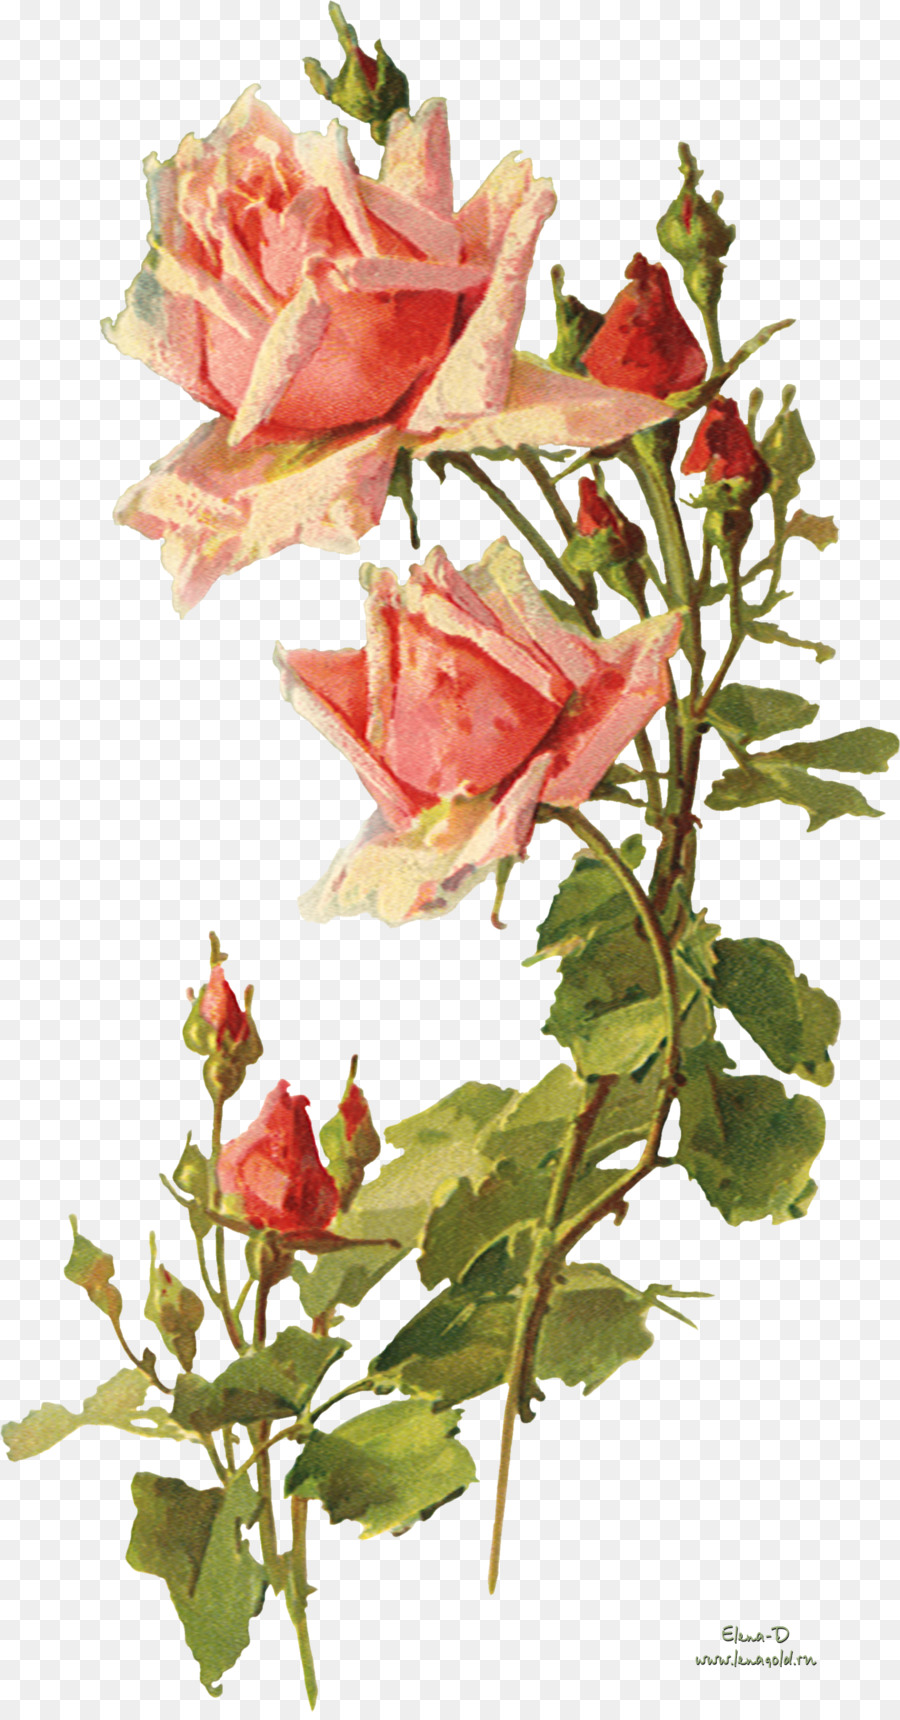 Garden Roses Flower Vintage Clothing Clip Art Watercolor